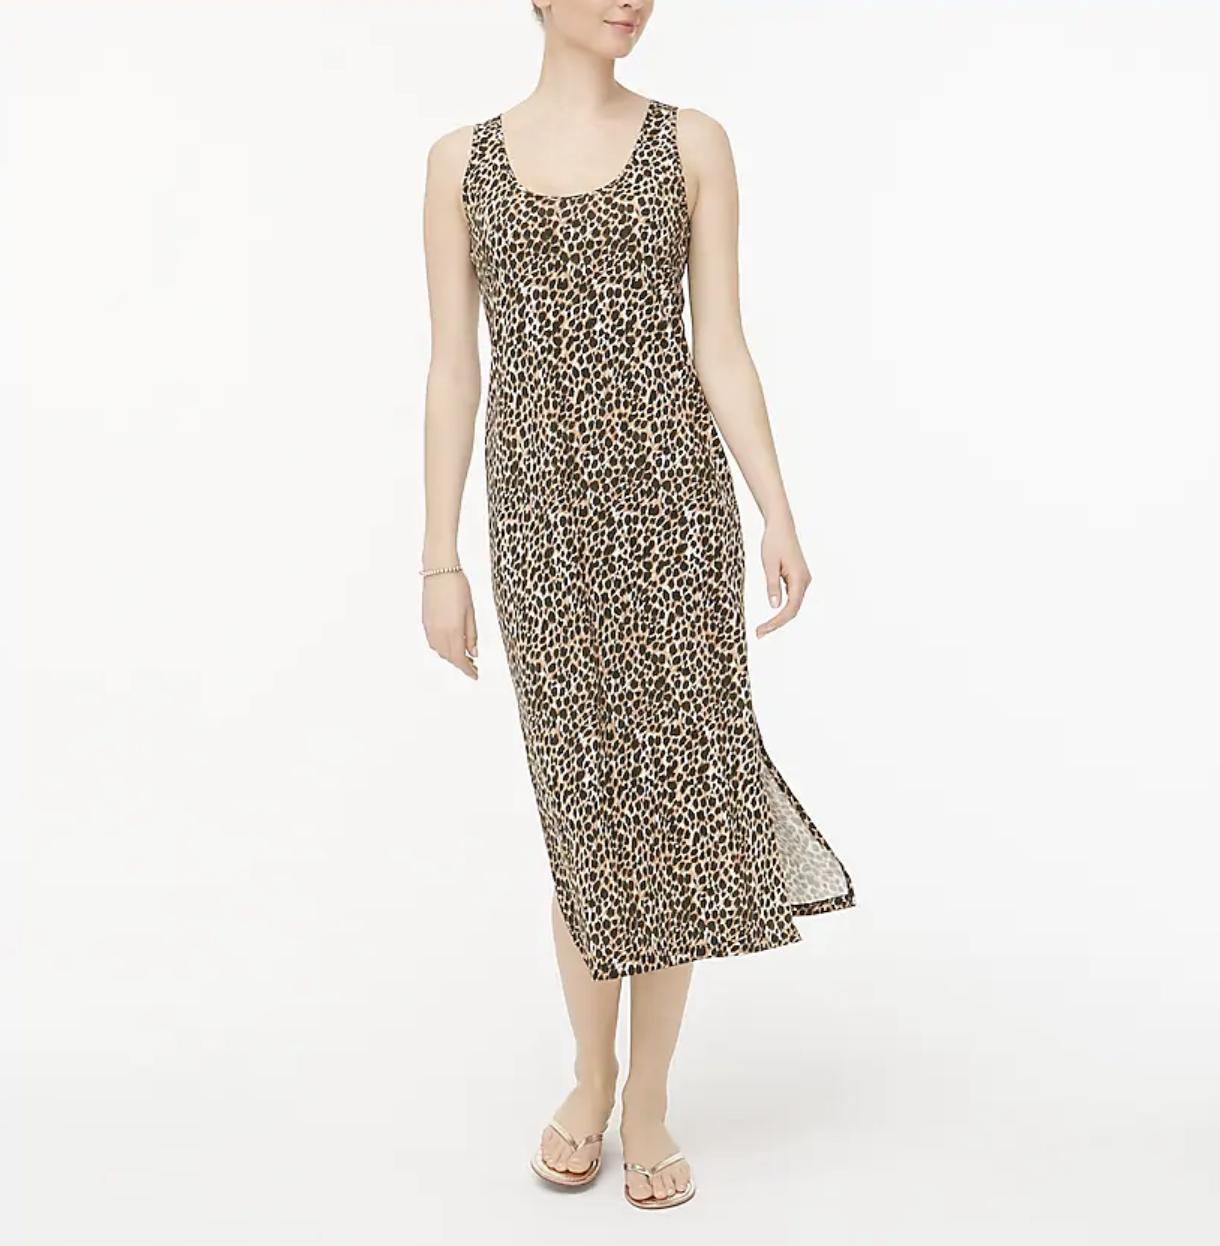 A model wears a leopard-print sleeveless knit midi dress